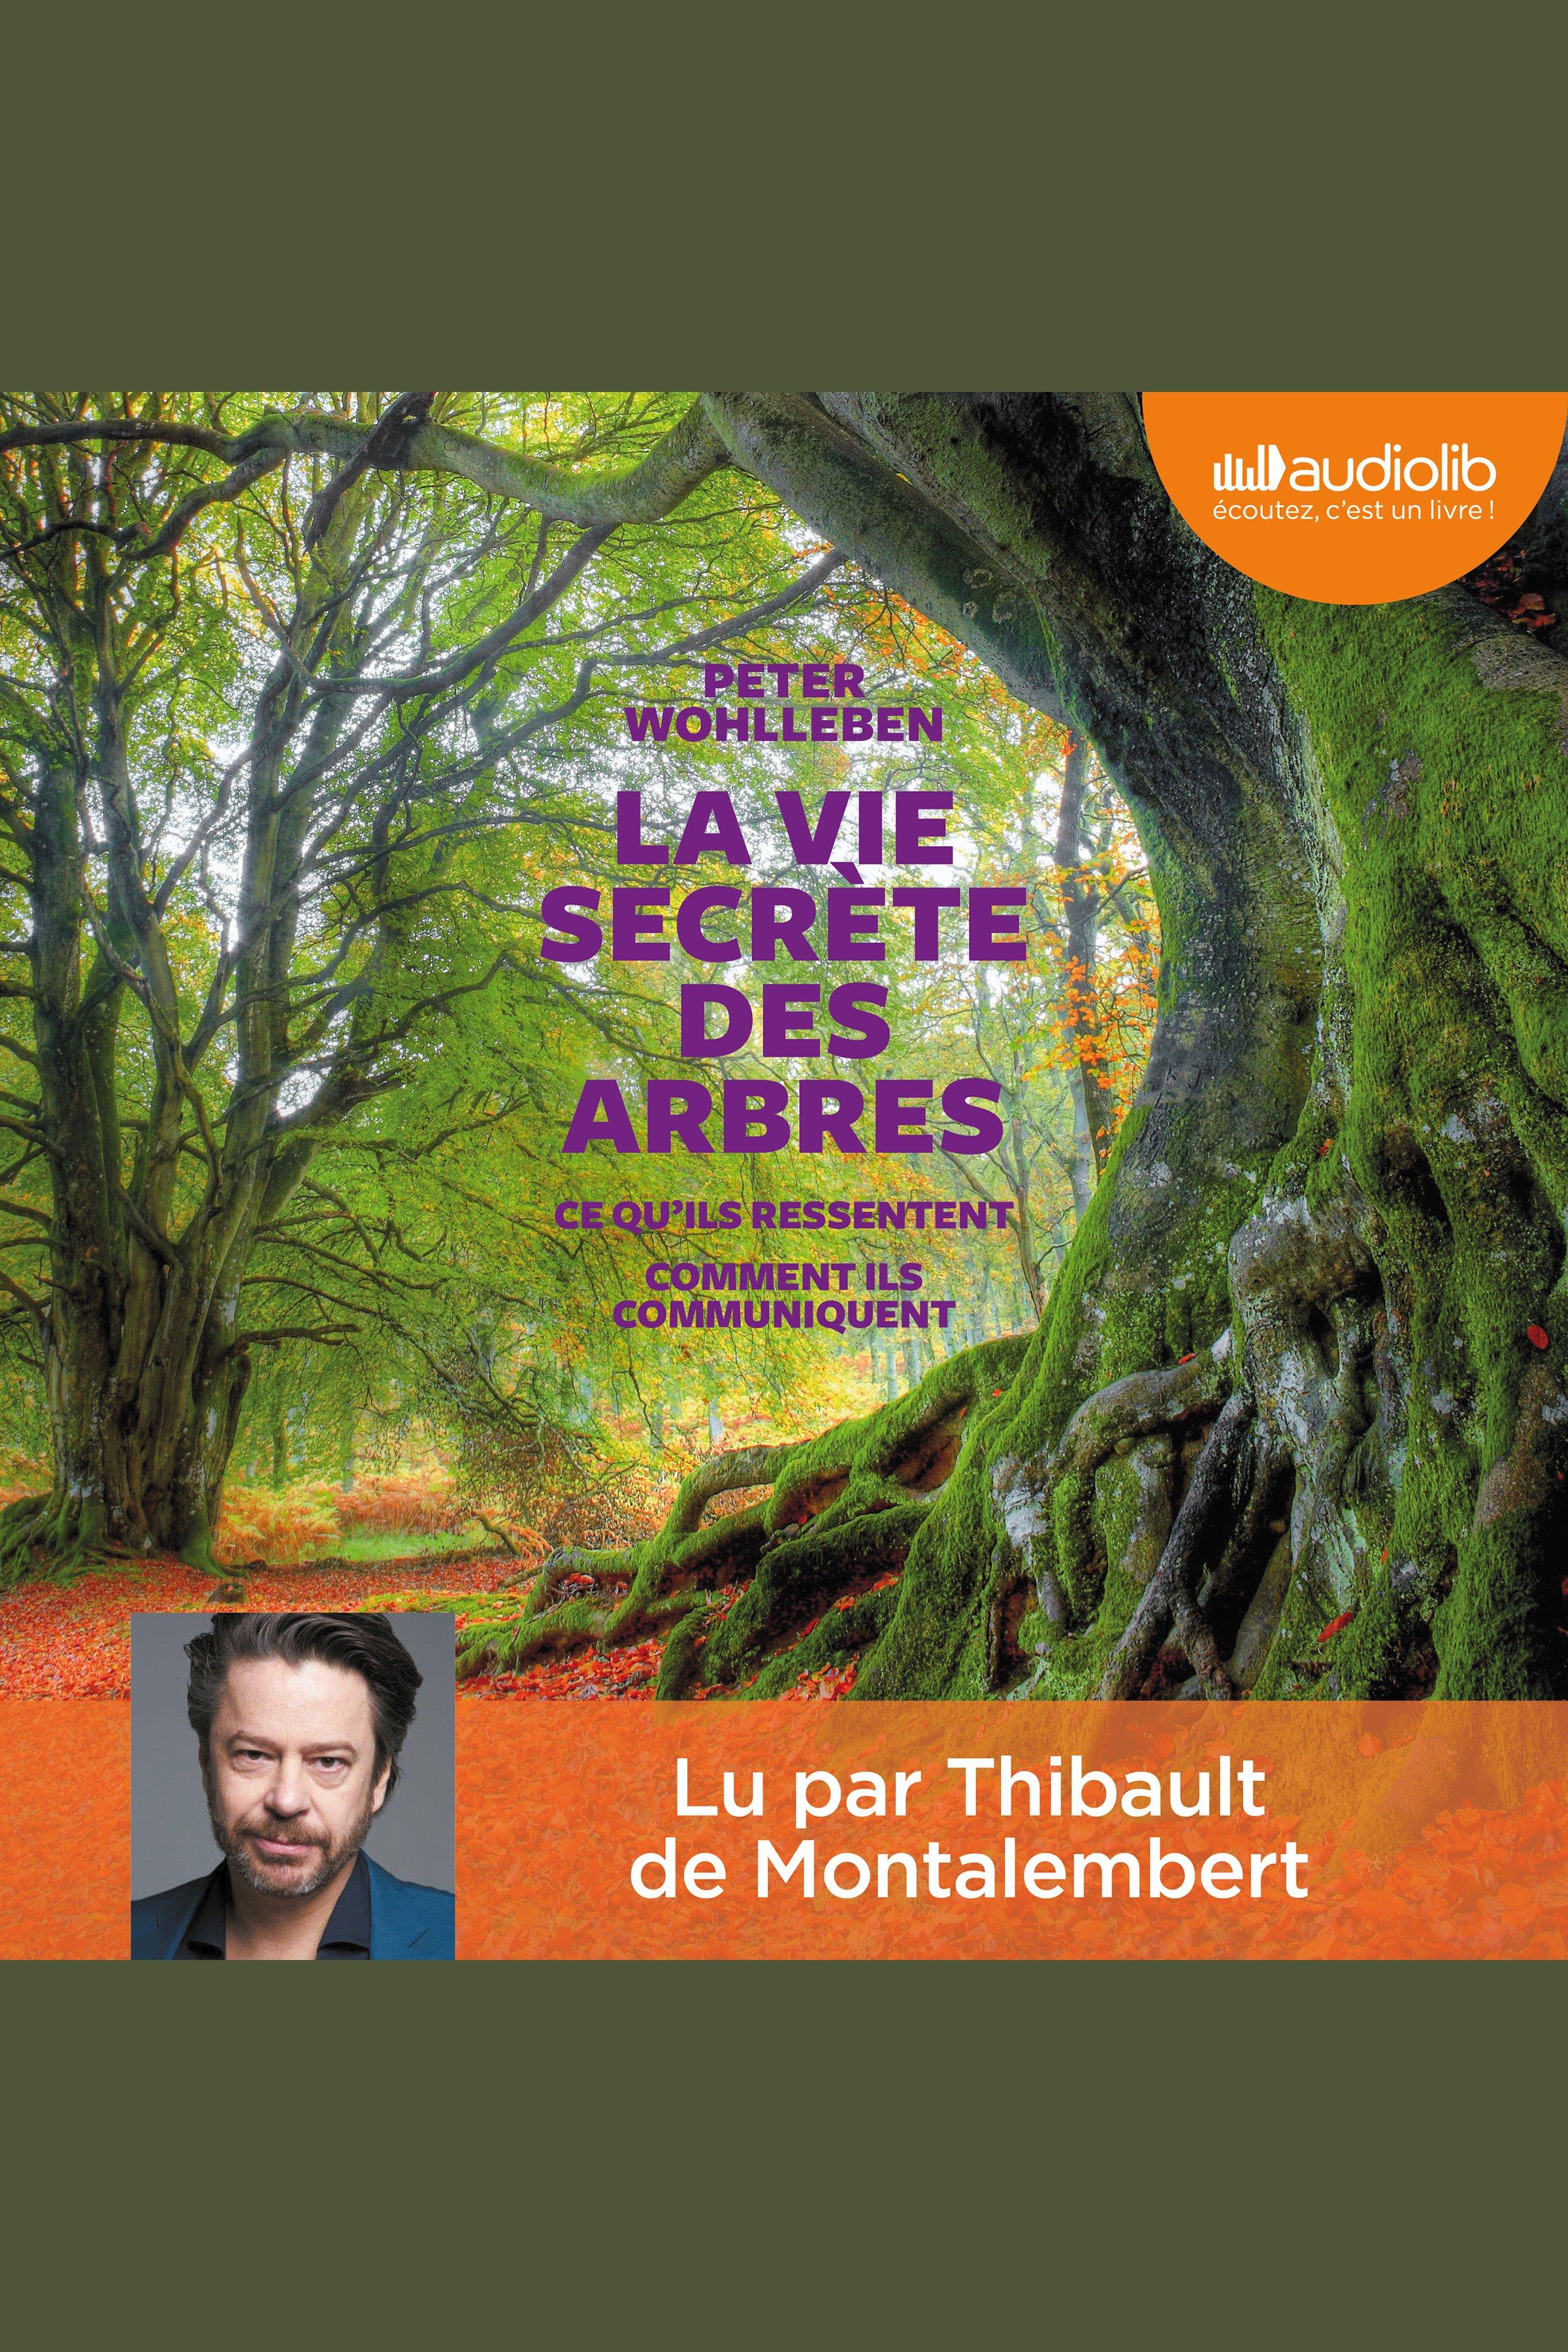 Image: La Vie secrète des arbres